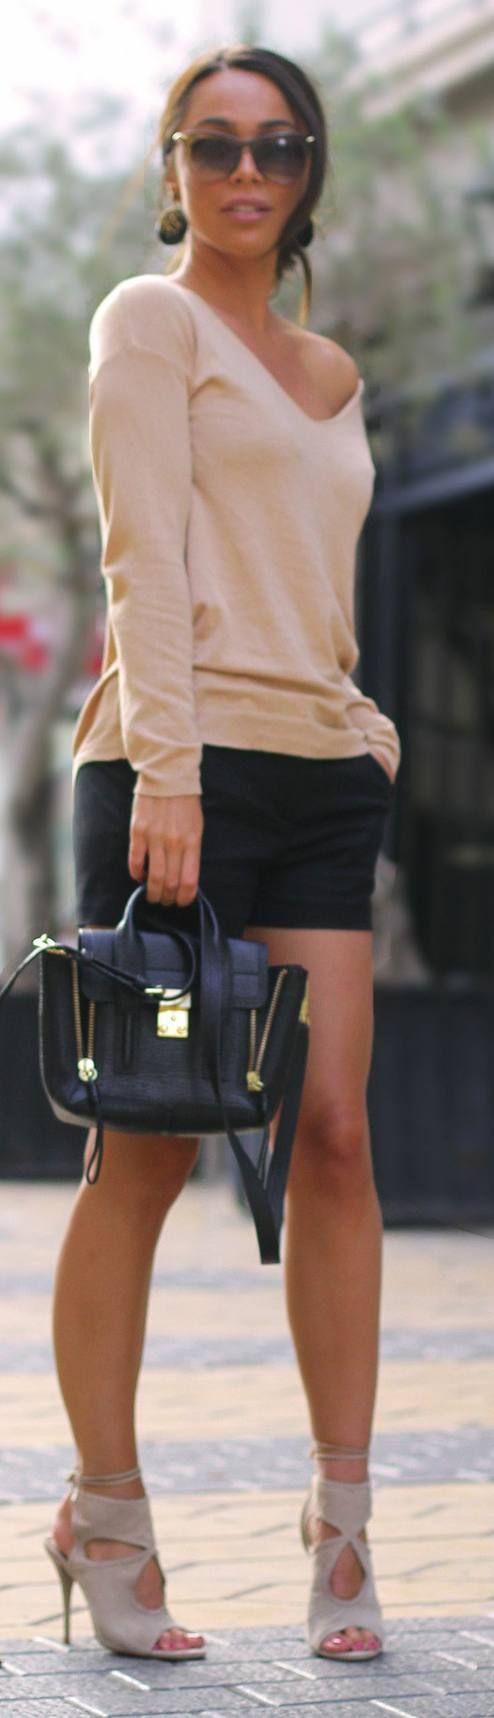 Aquazzura Beige Suede Cutout Detail Ankle Tie Heeled Sandals